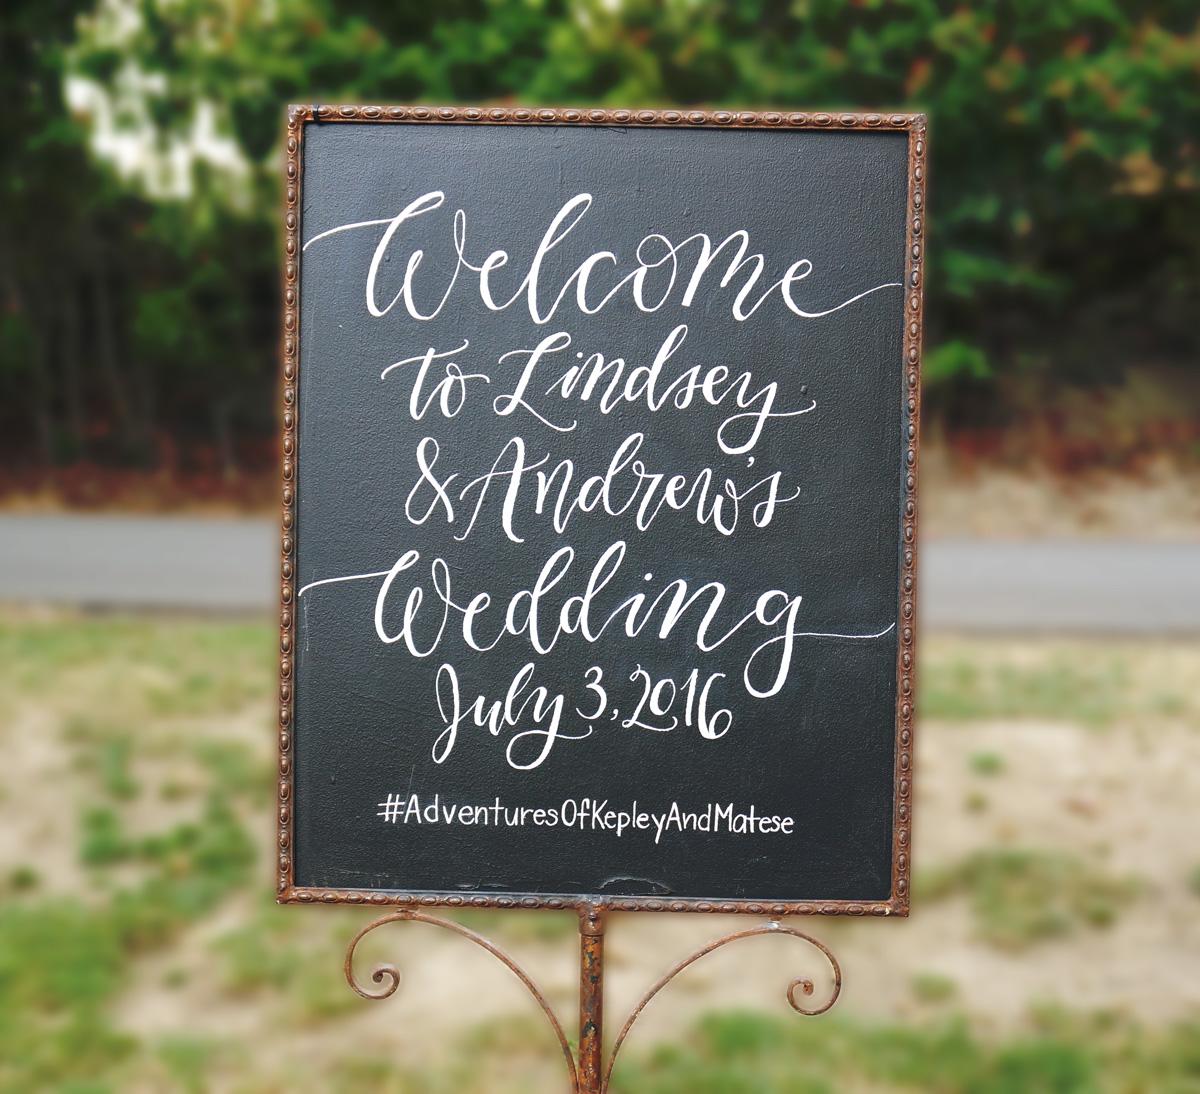 LindseyMatese-Welcome1.jpg